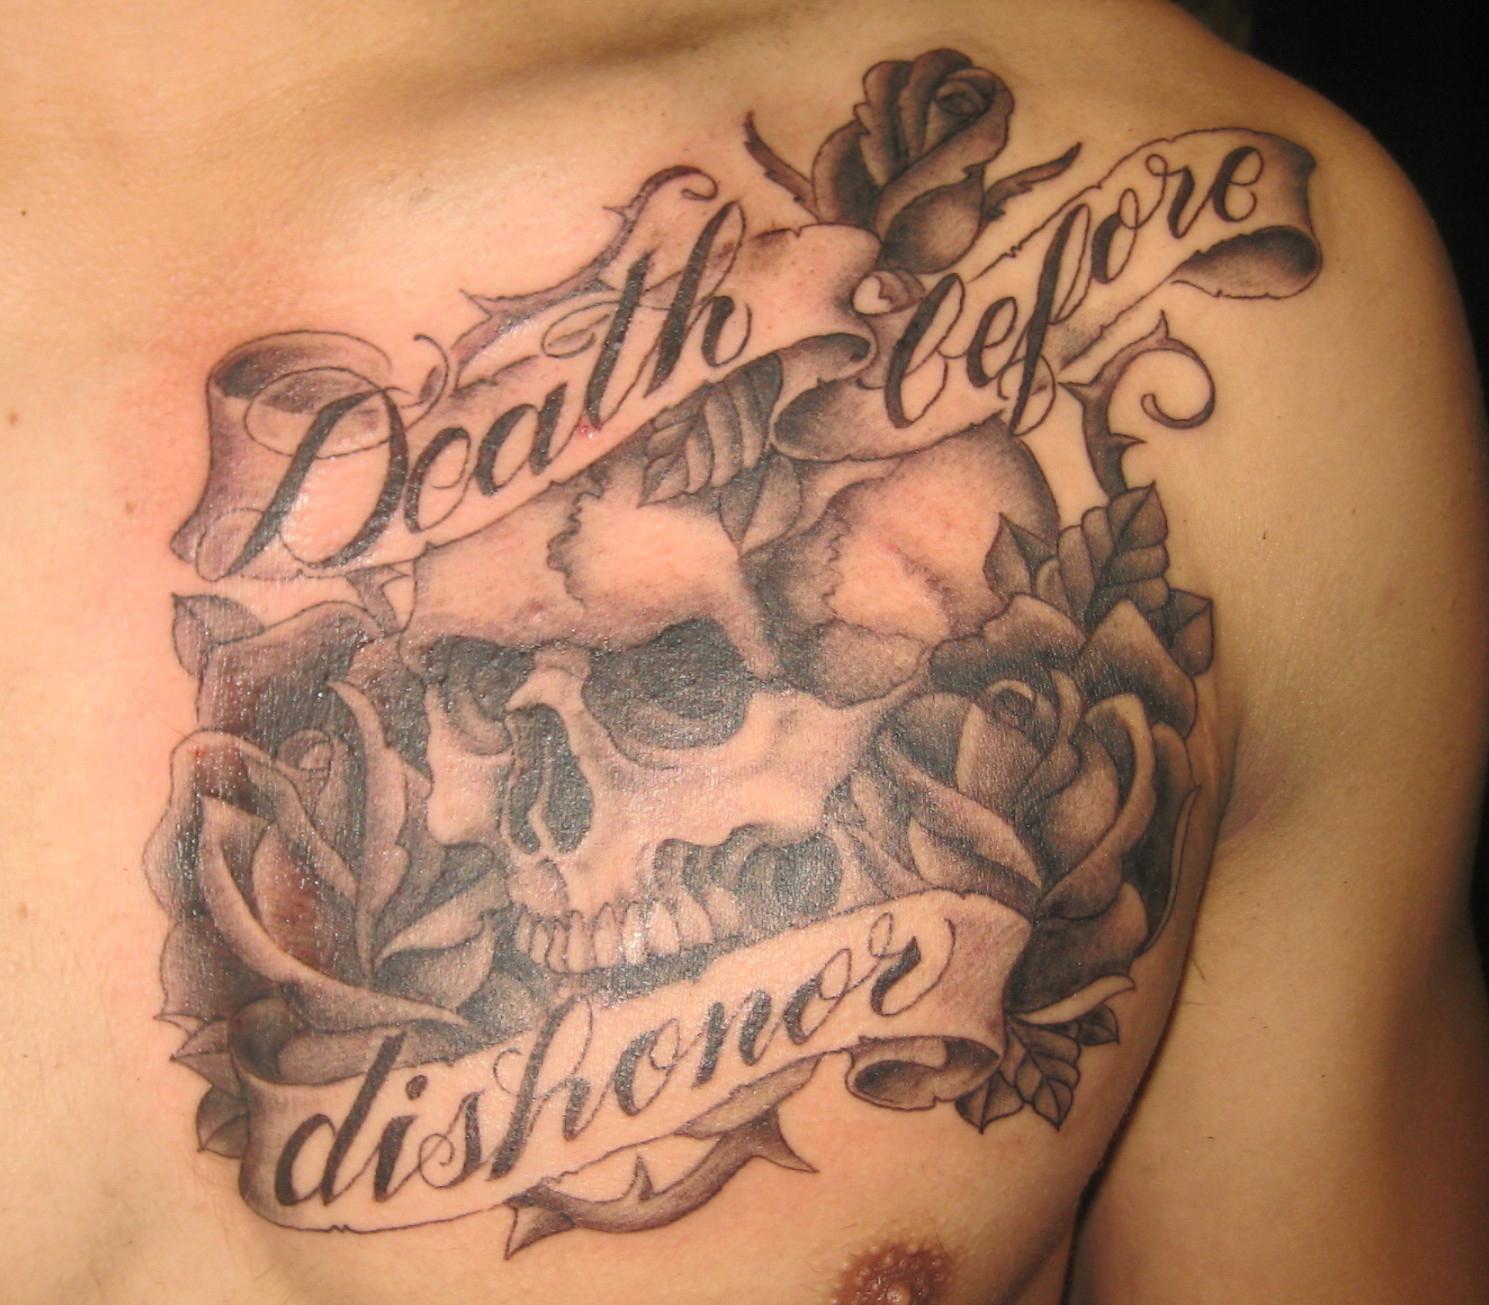 Shanninscrapandcrap: Tattoo Maker